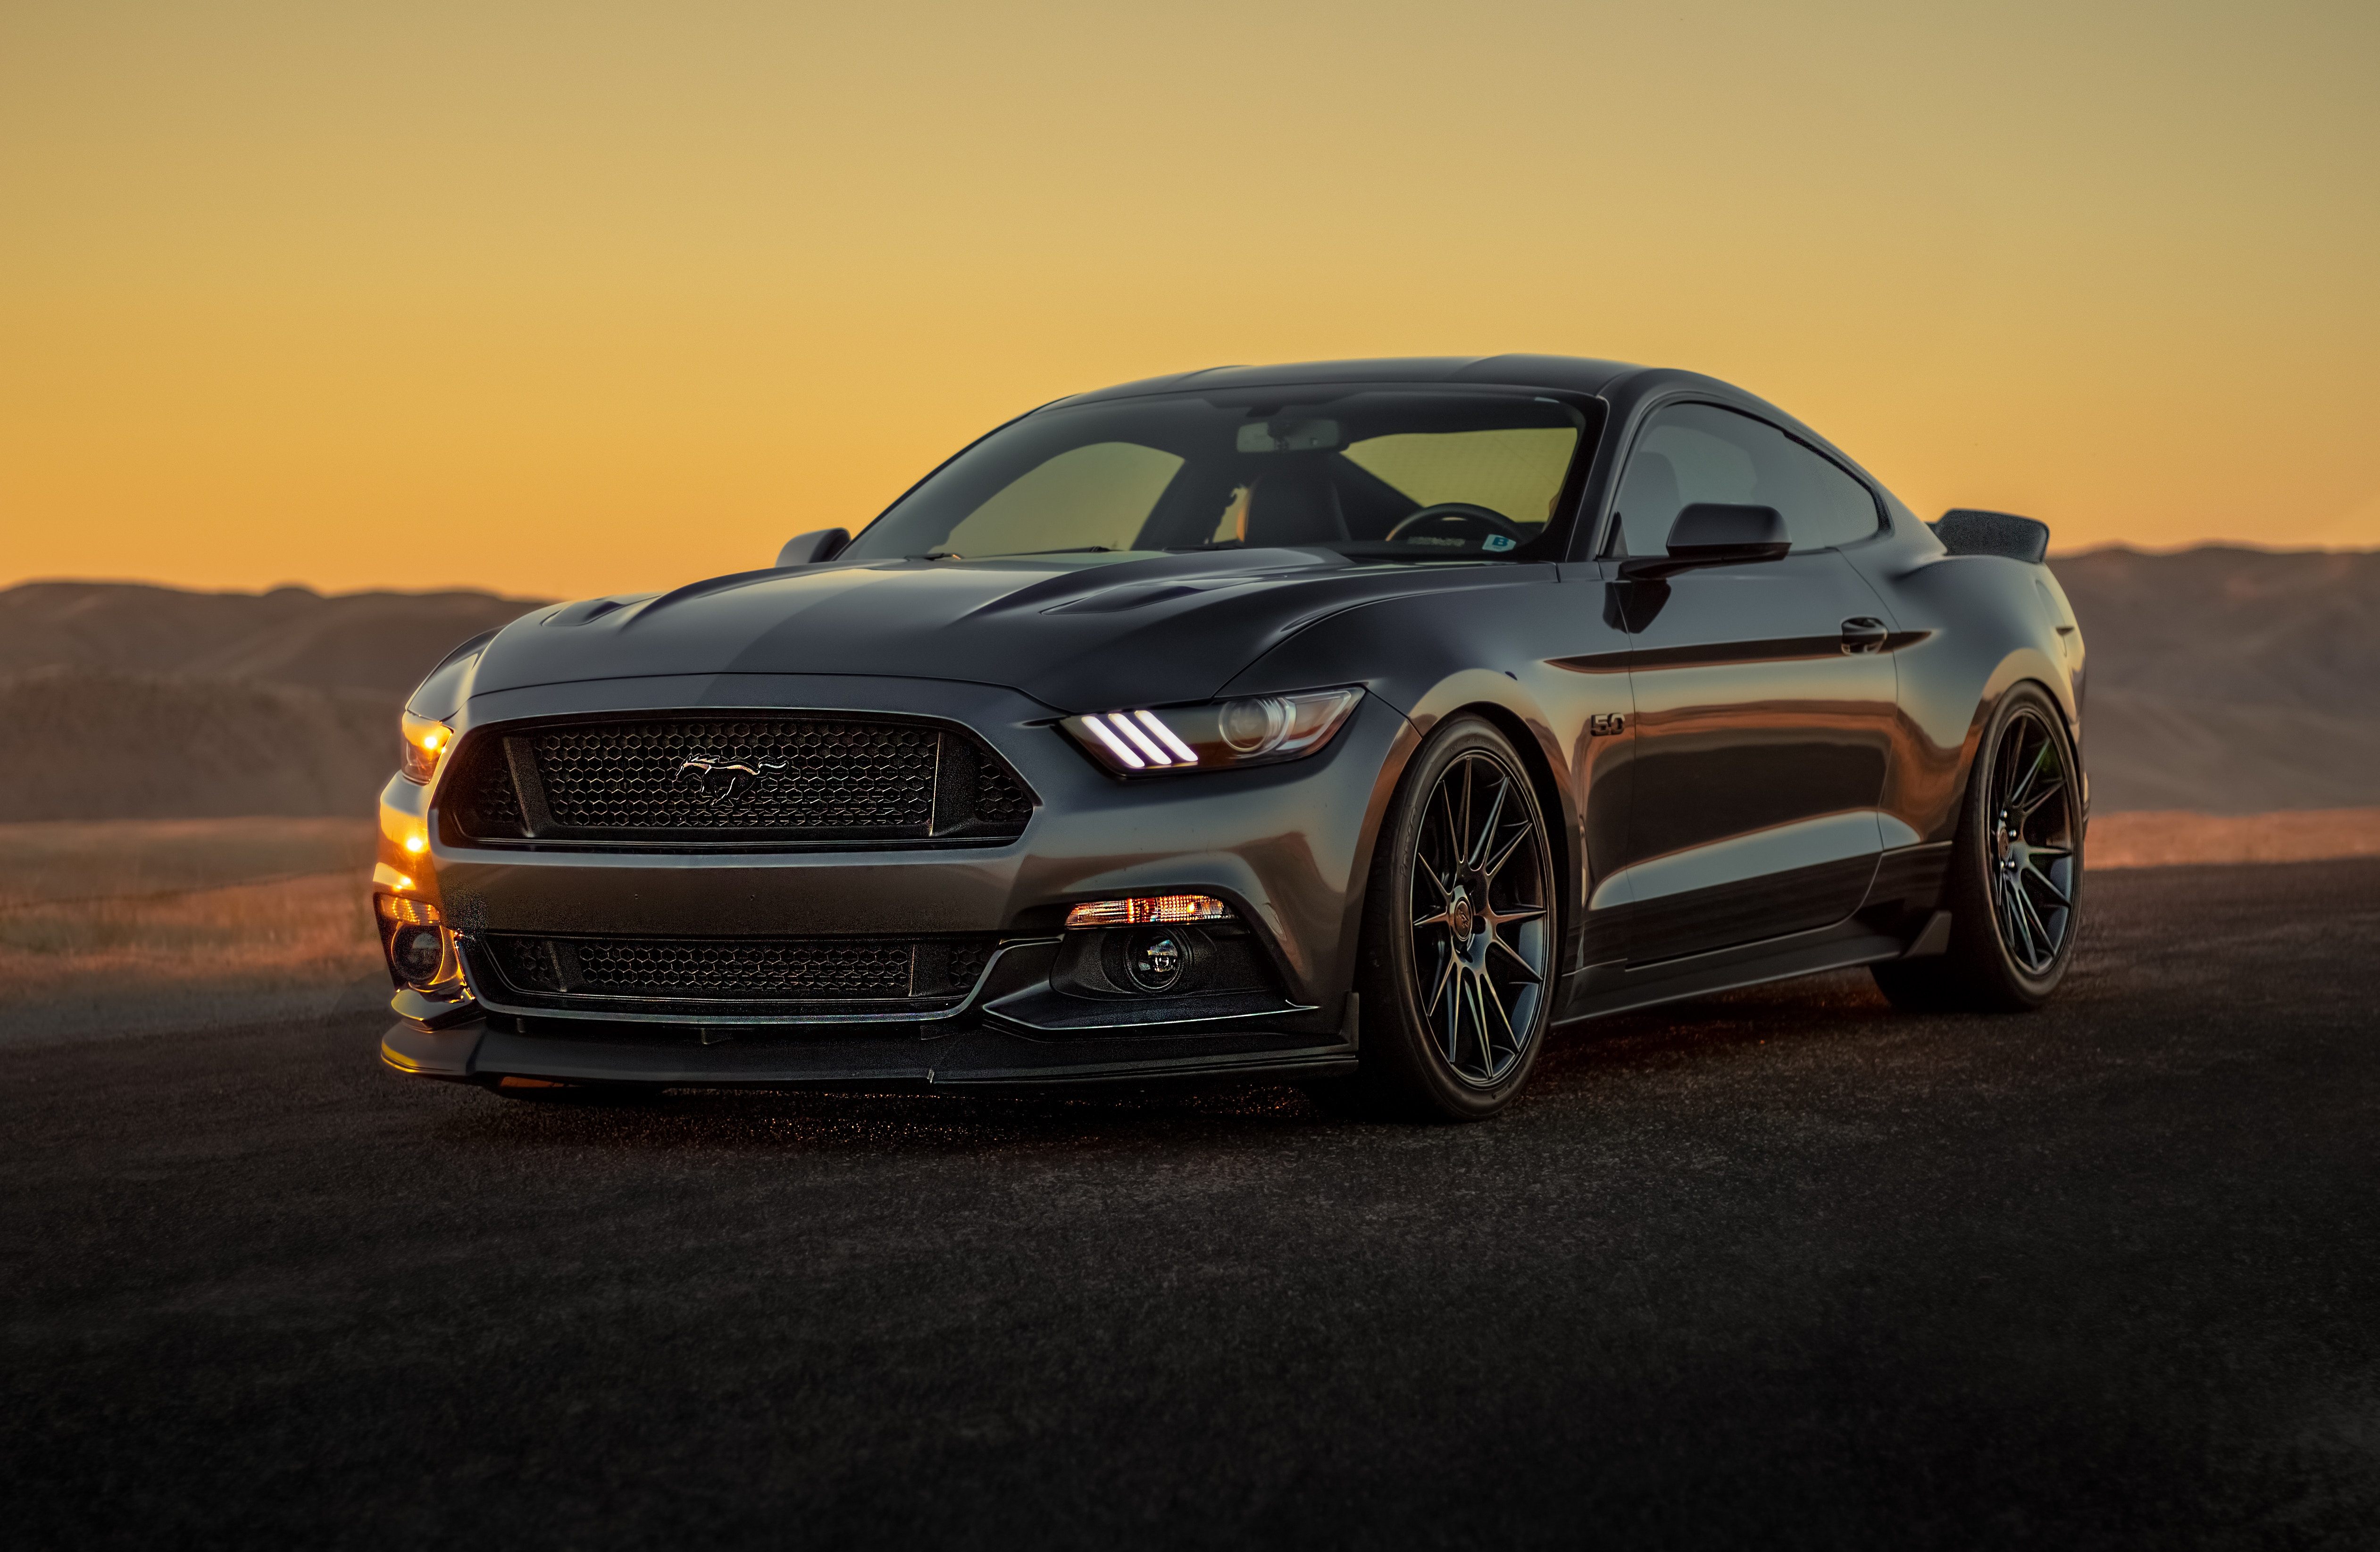 Ford Mustang 4k Ultra HD Wallpaper